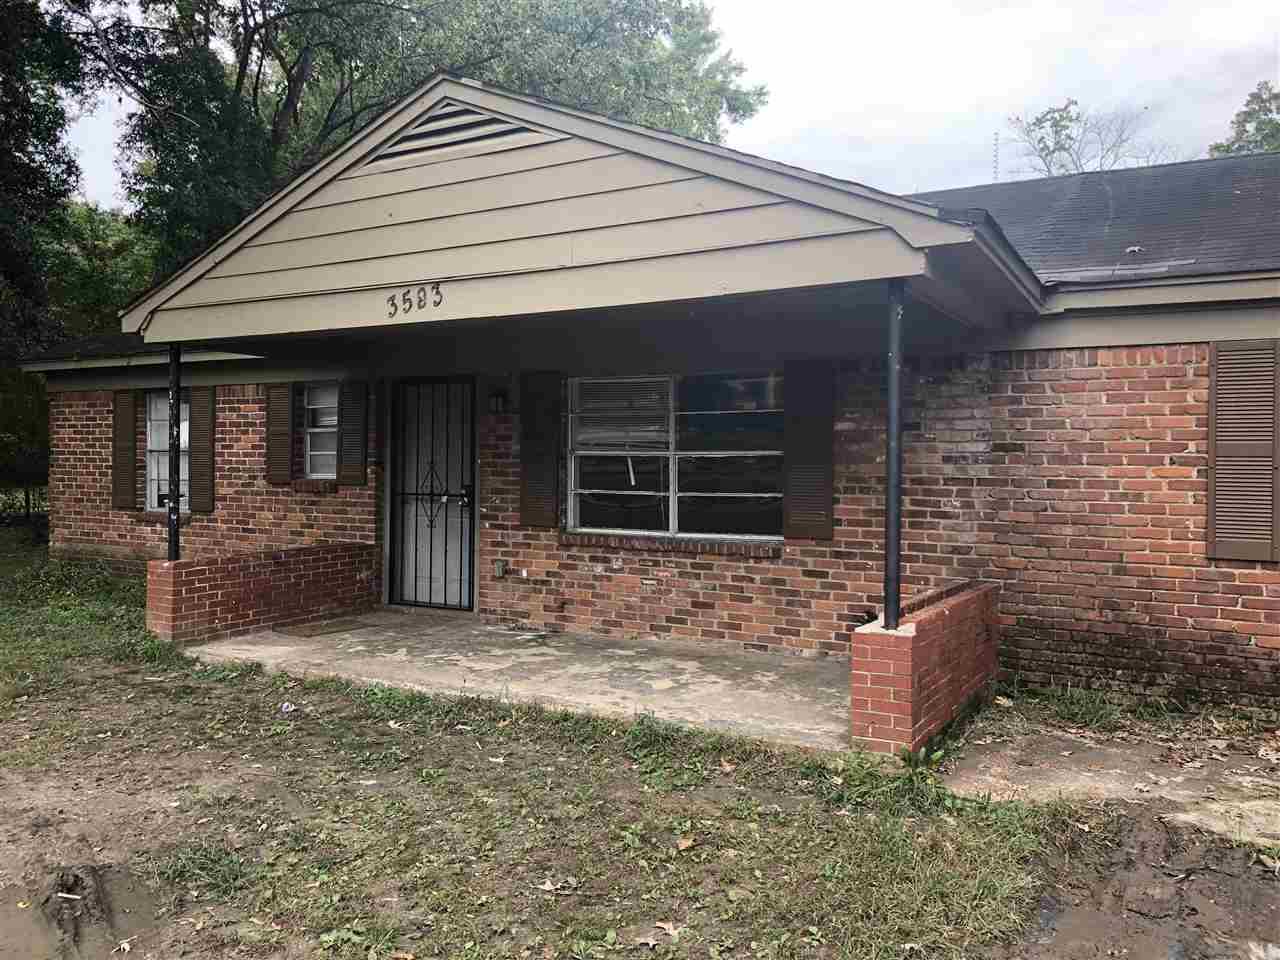 3583 Early, Memphis, TN 38127